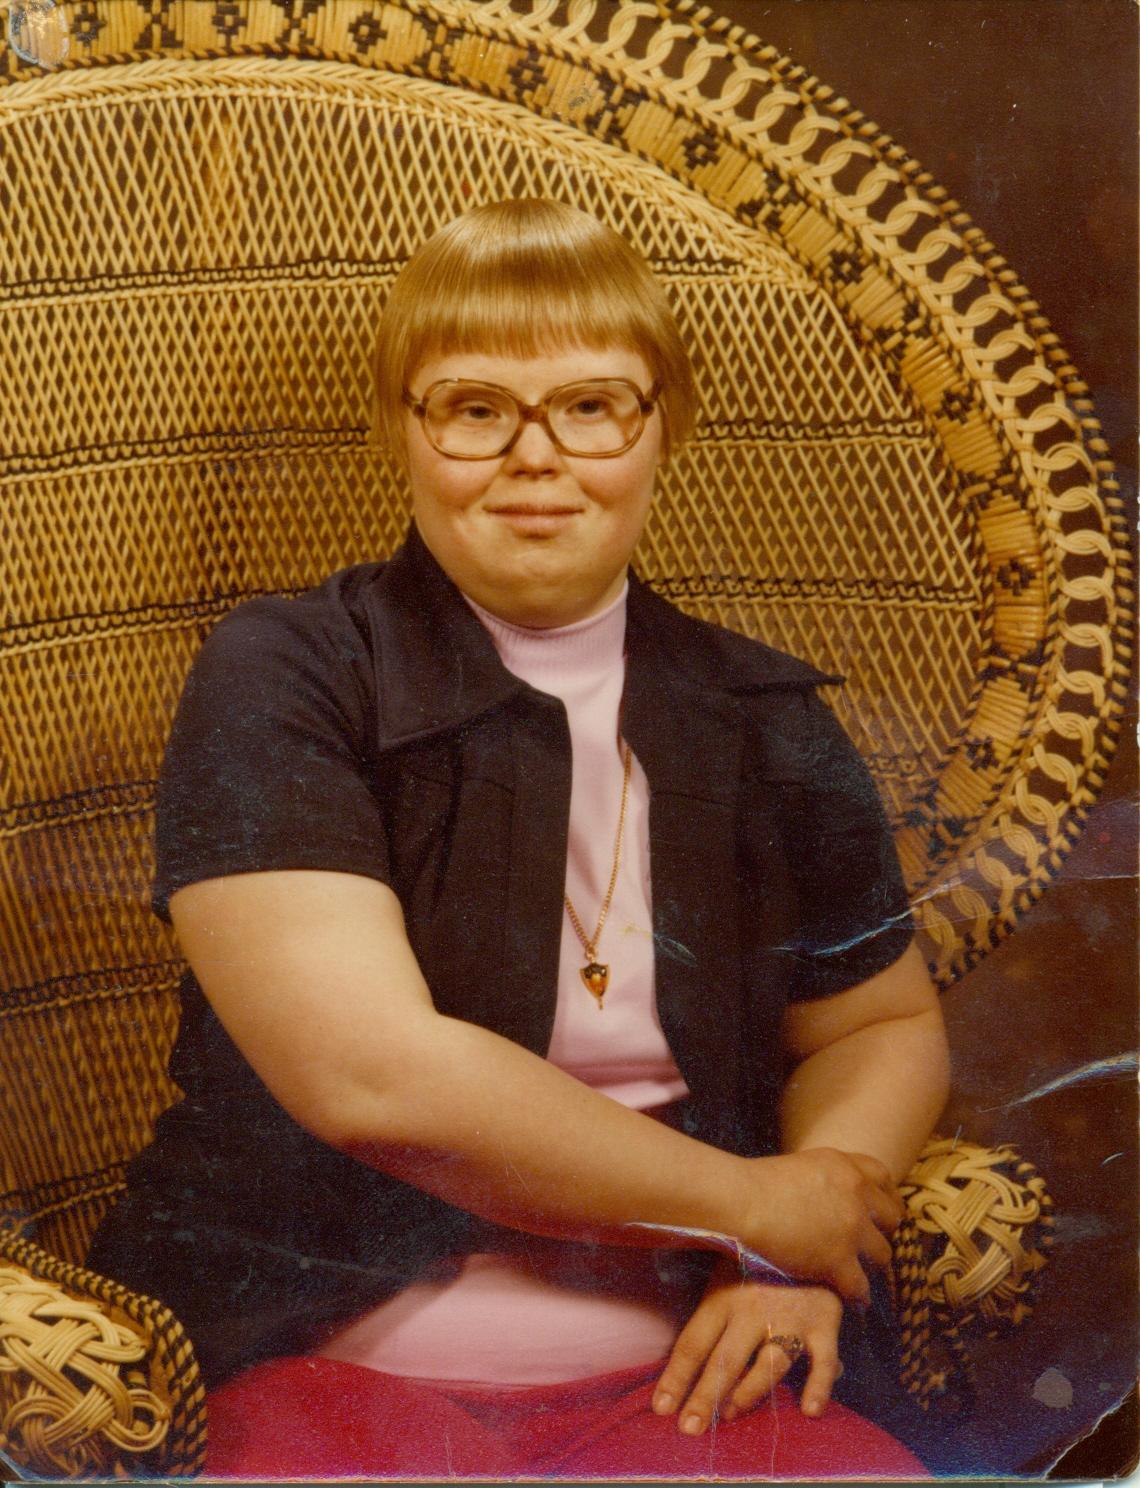 Local obituaries from kltz in glasgow montana mary ann squires altavistaventures Choice Image